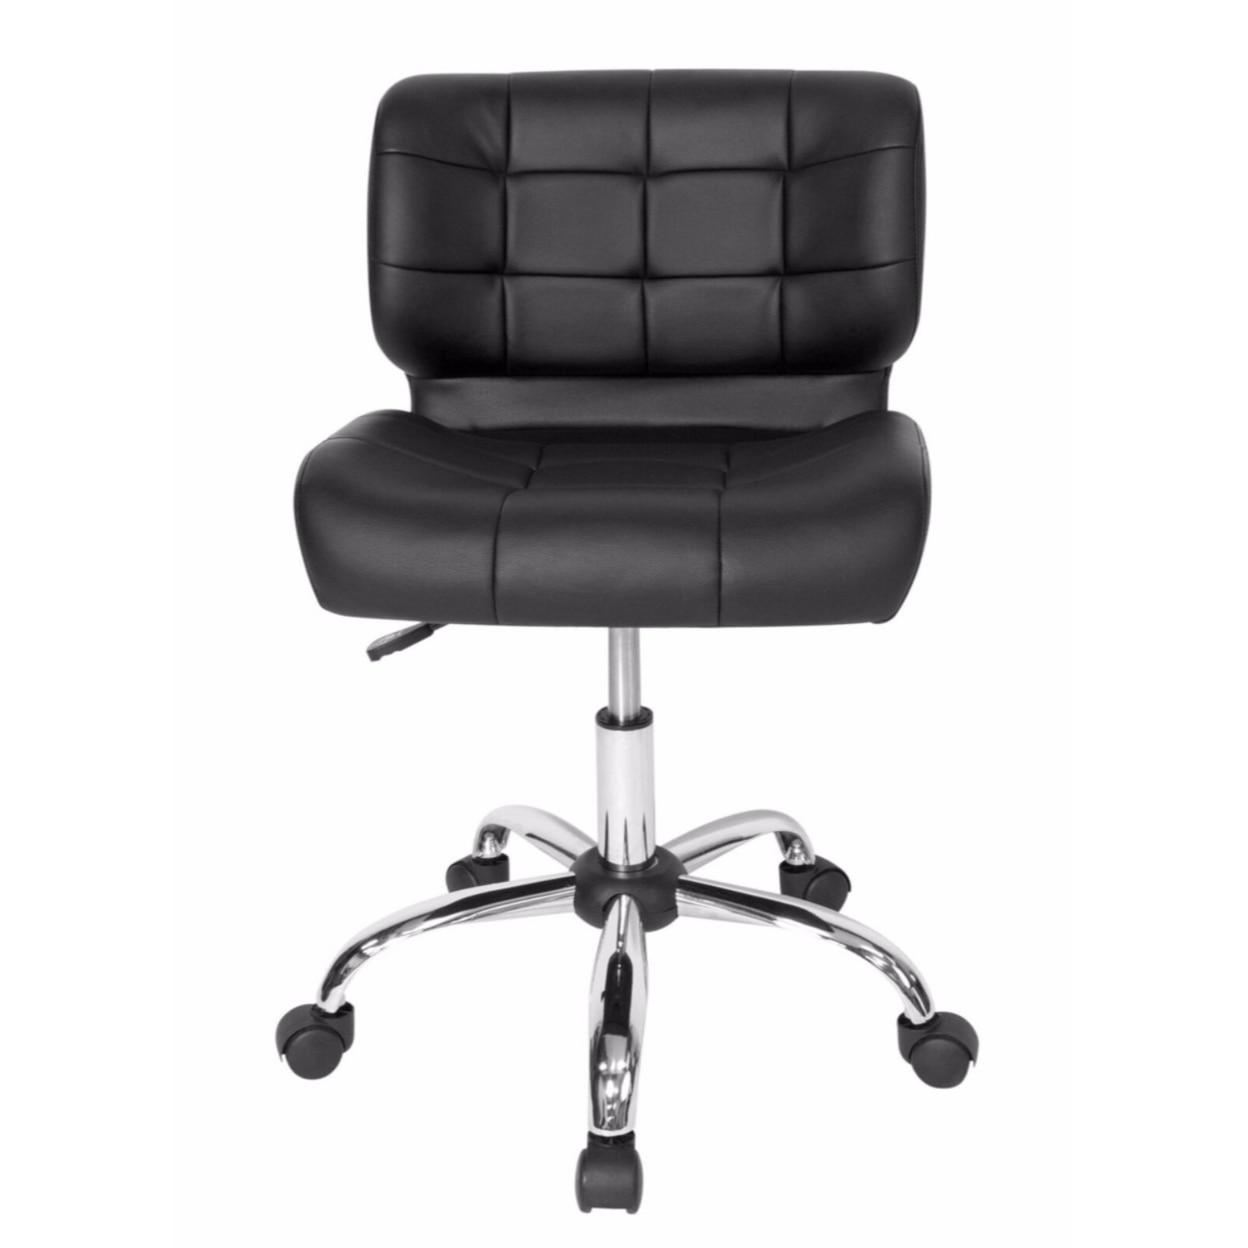 Studio Designs Home Office Black Crest Office Chair - Chrome/Black studio designs home office maxima ii drafting chair black